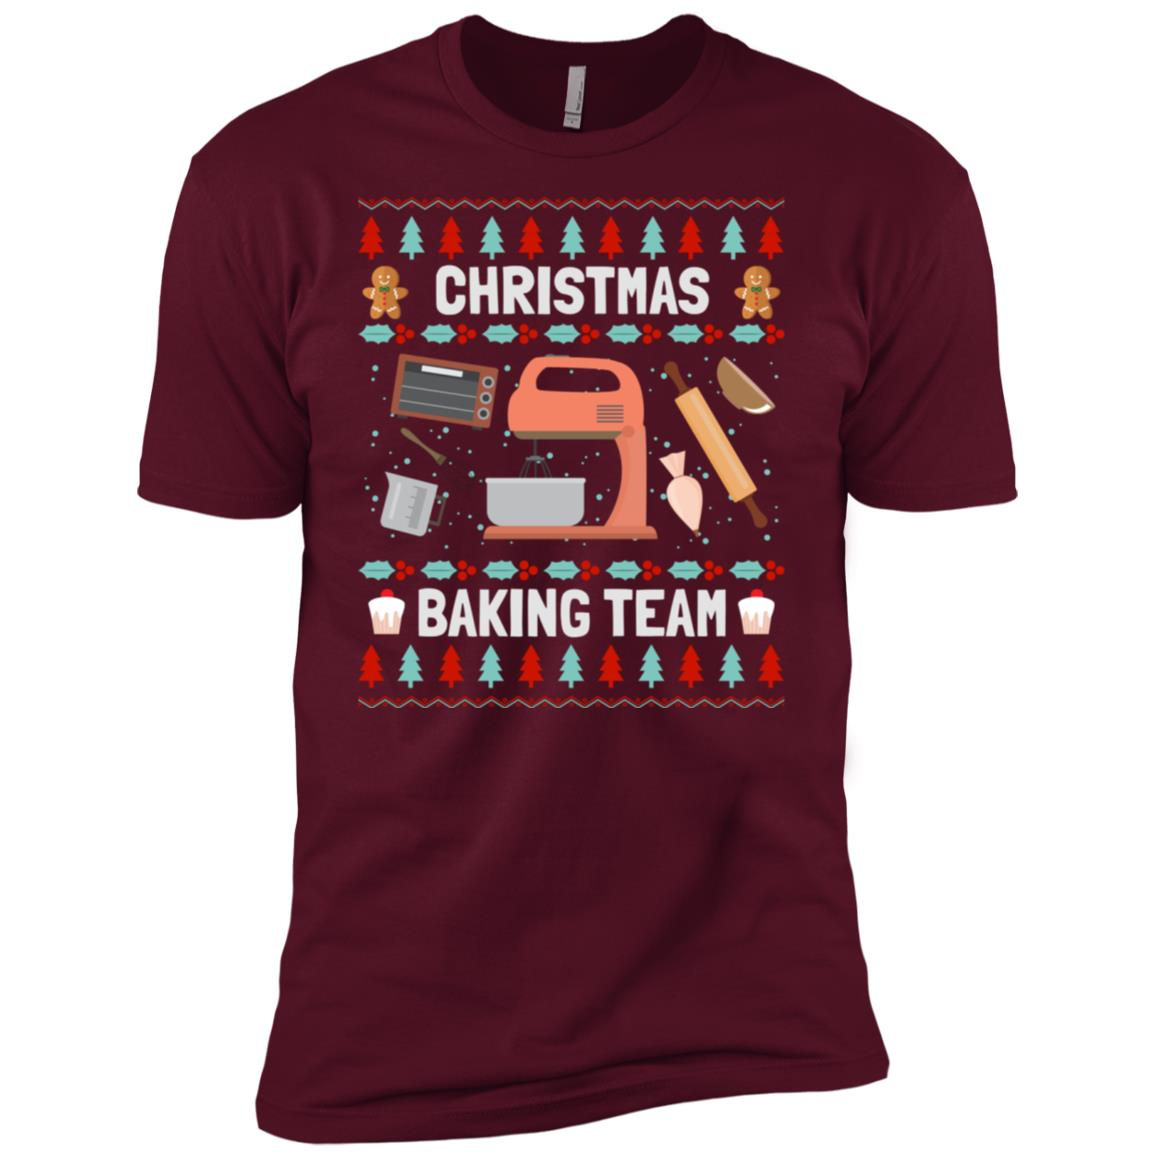 Christmas Baking Team Ugly Sweater Bakers Xmas Gifts Men Short Sleeve T-Shirt